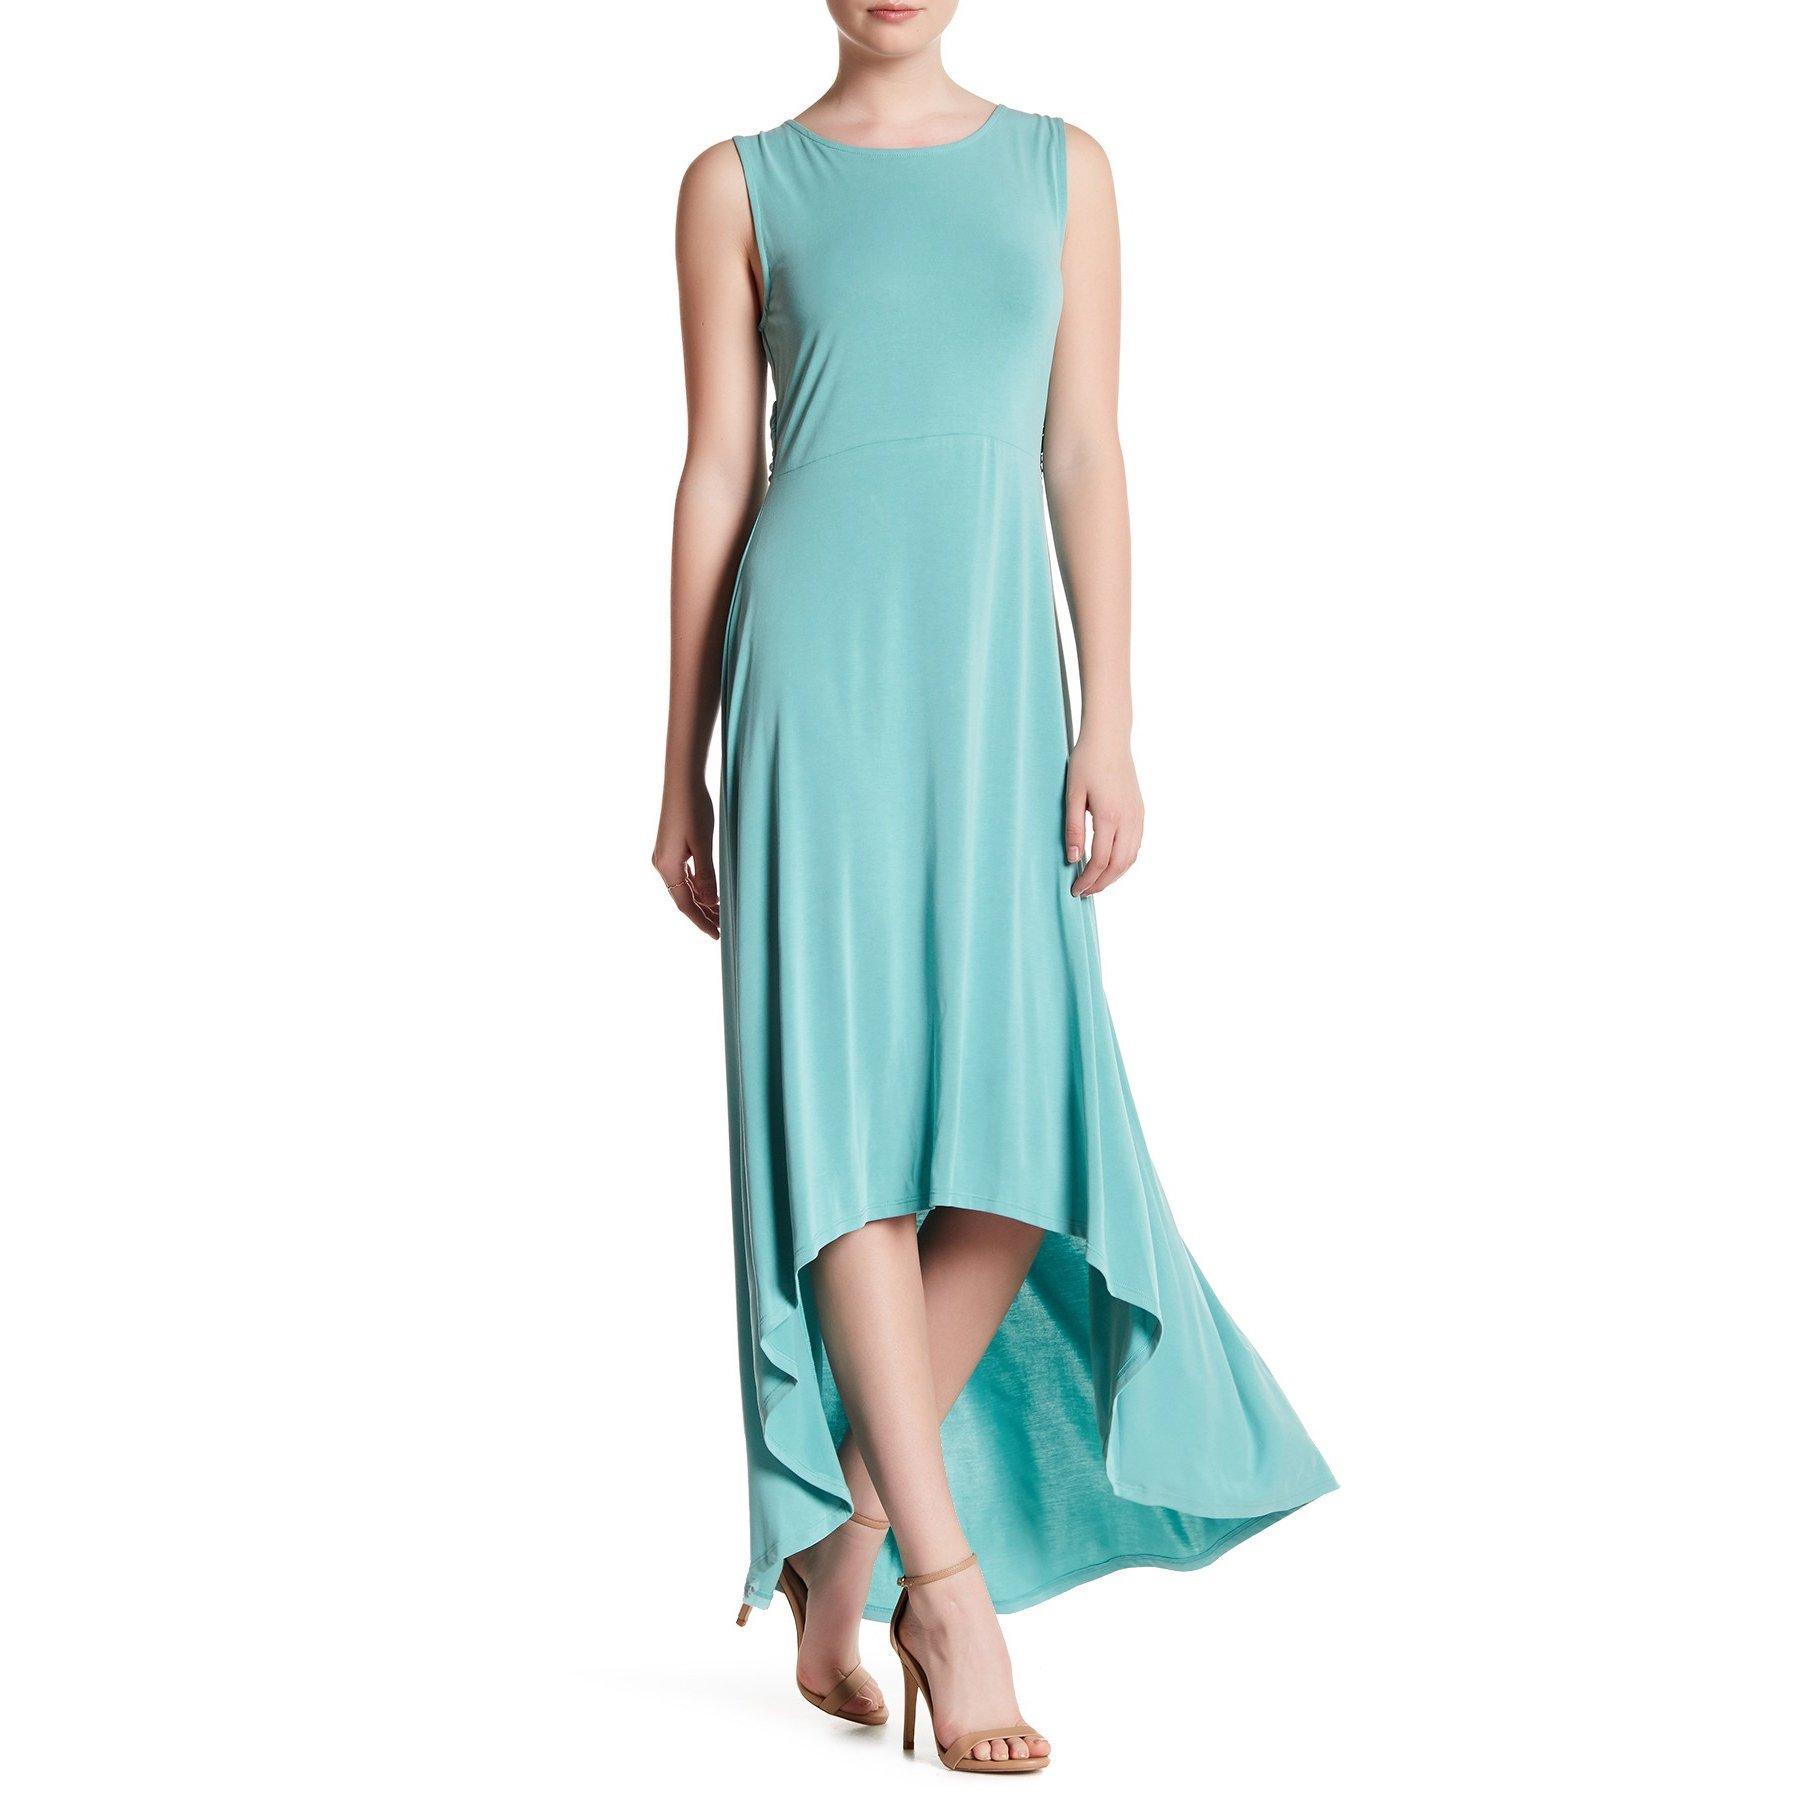 Available at Amazon: BCBG MaxAzria Dress Fara High Low Twist Back Aqua XS